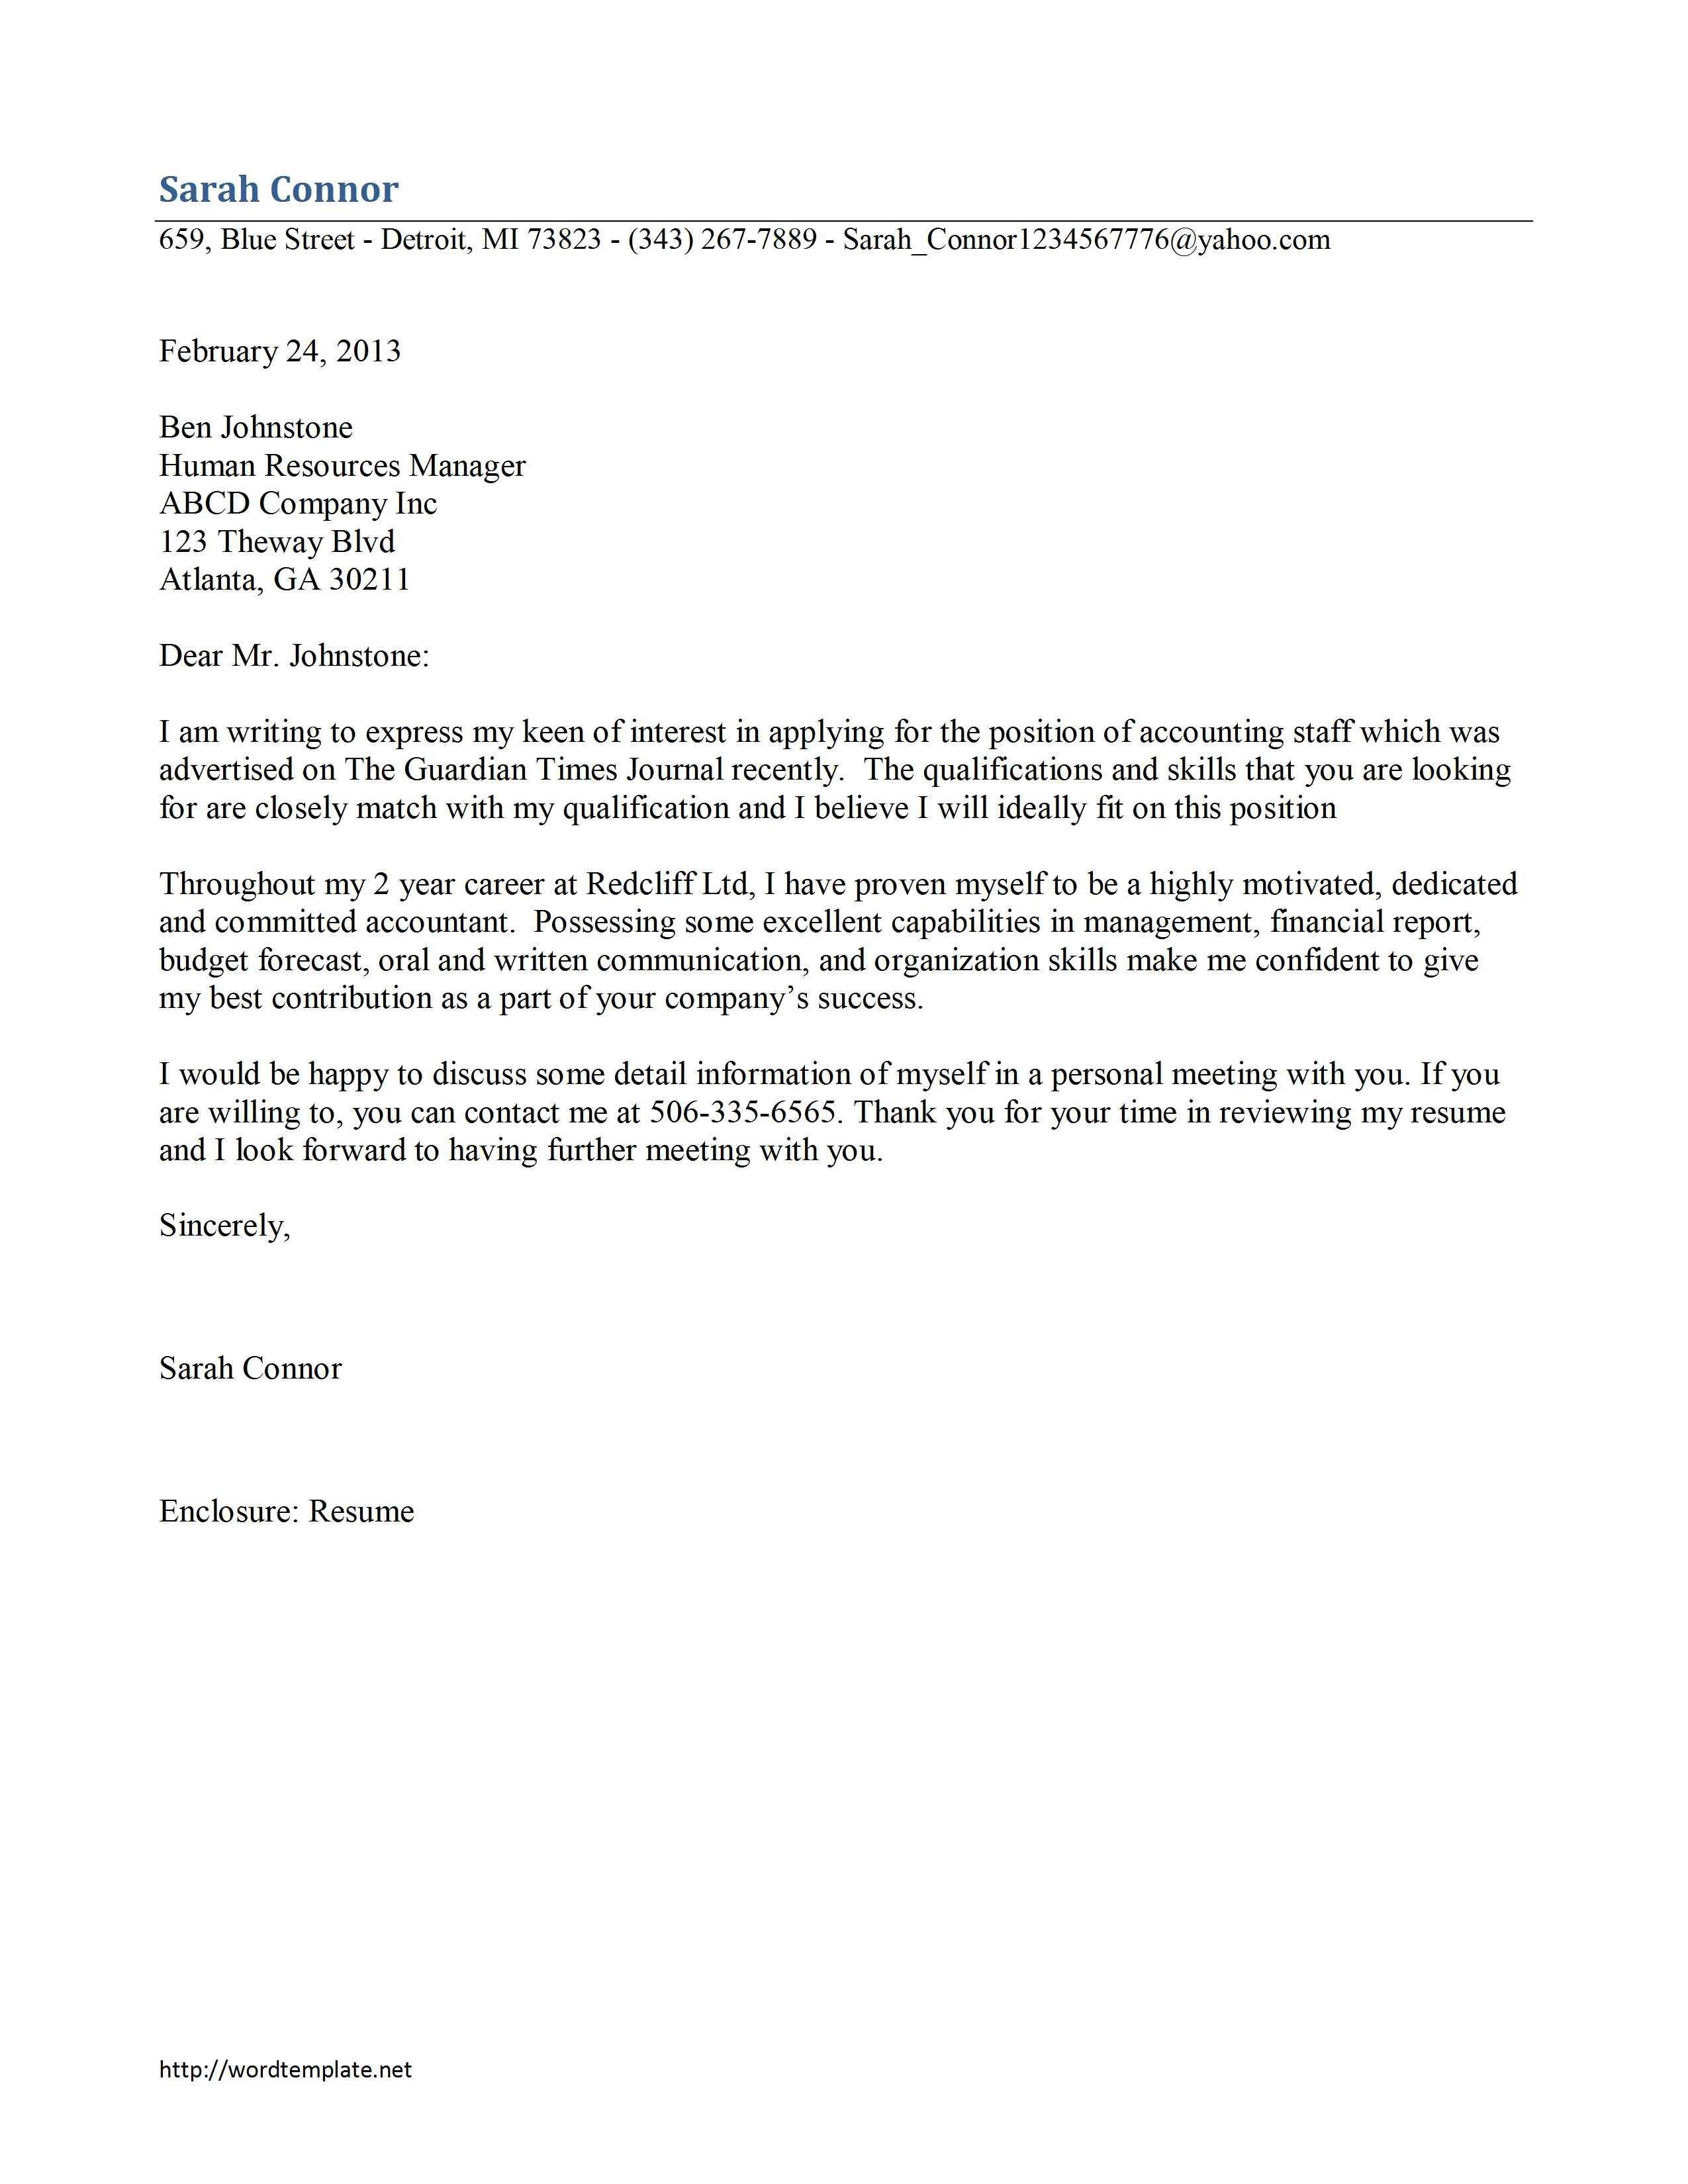 009 Phenomenal Email Cover Letter Example Uk Inspiration Full